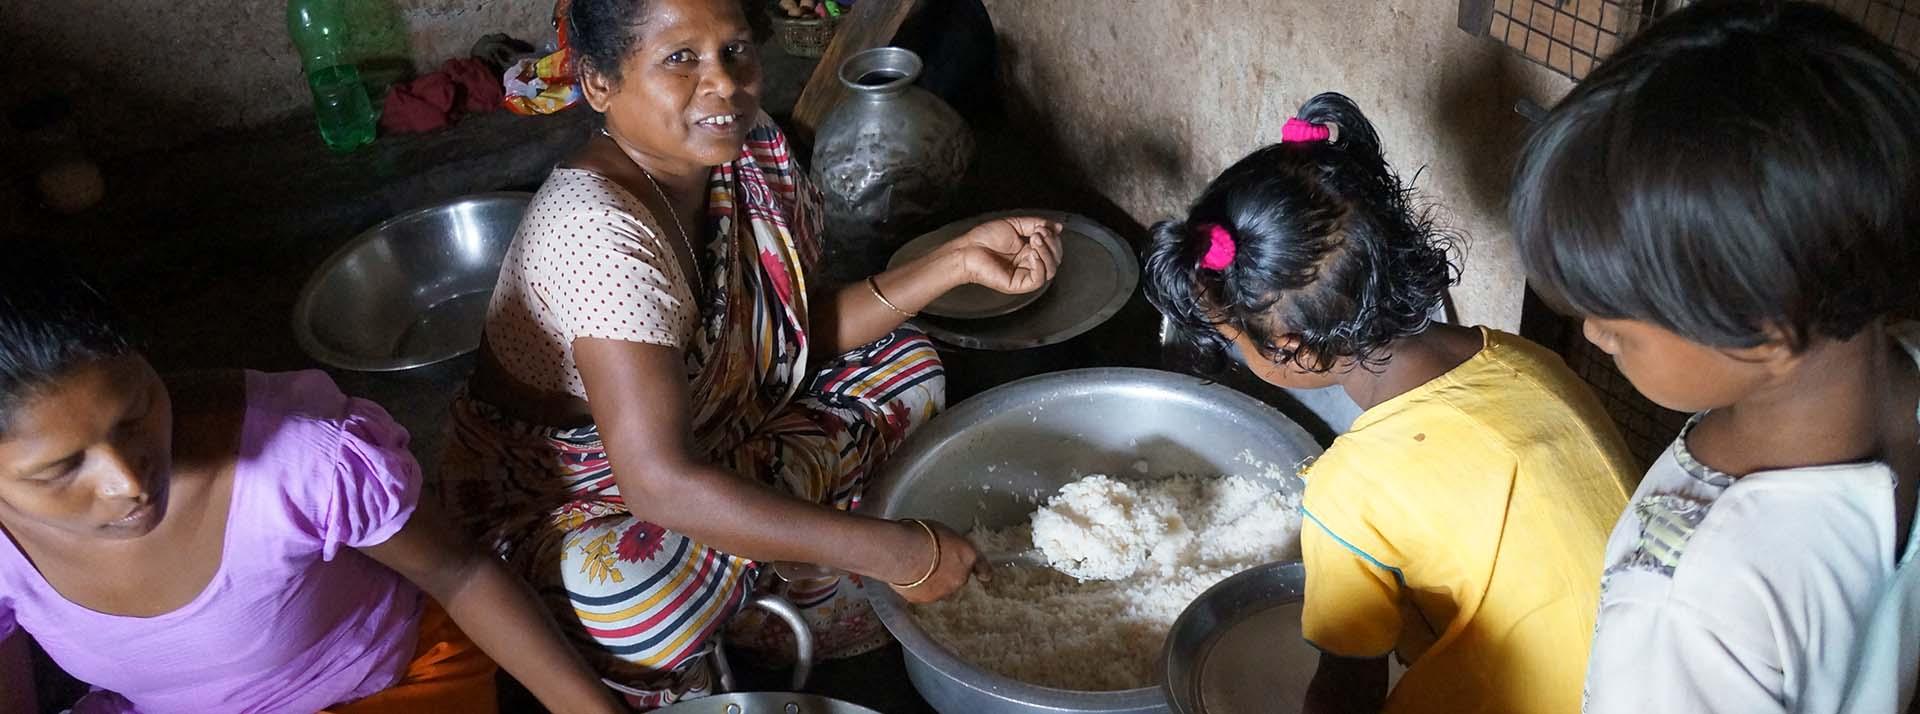 Sponsor needy women for skill training